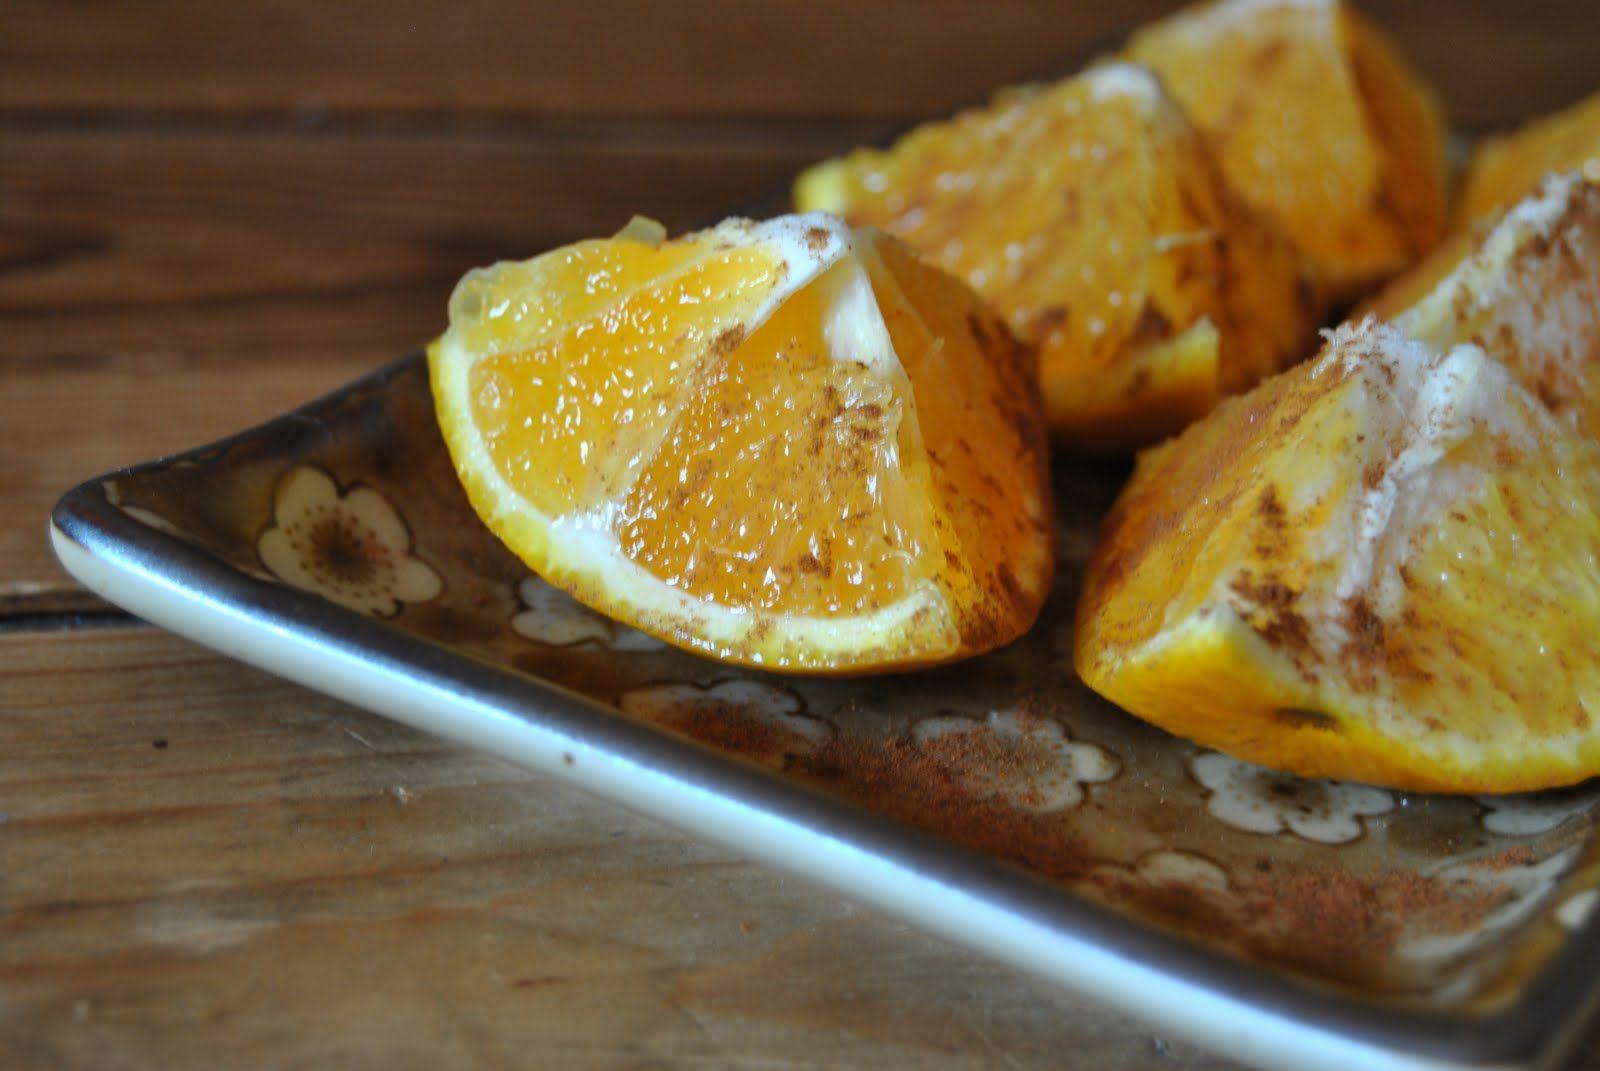 Moroccan dessert: oranges with cinnamon | Eat me | Pinterest